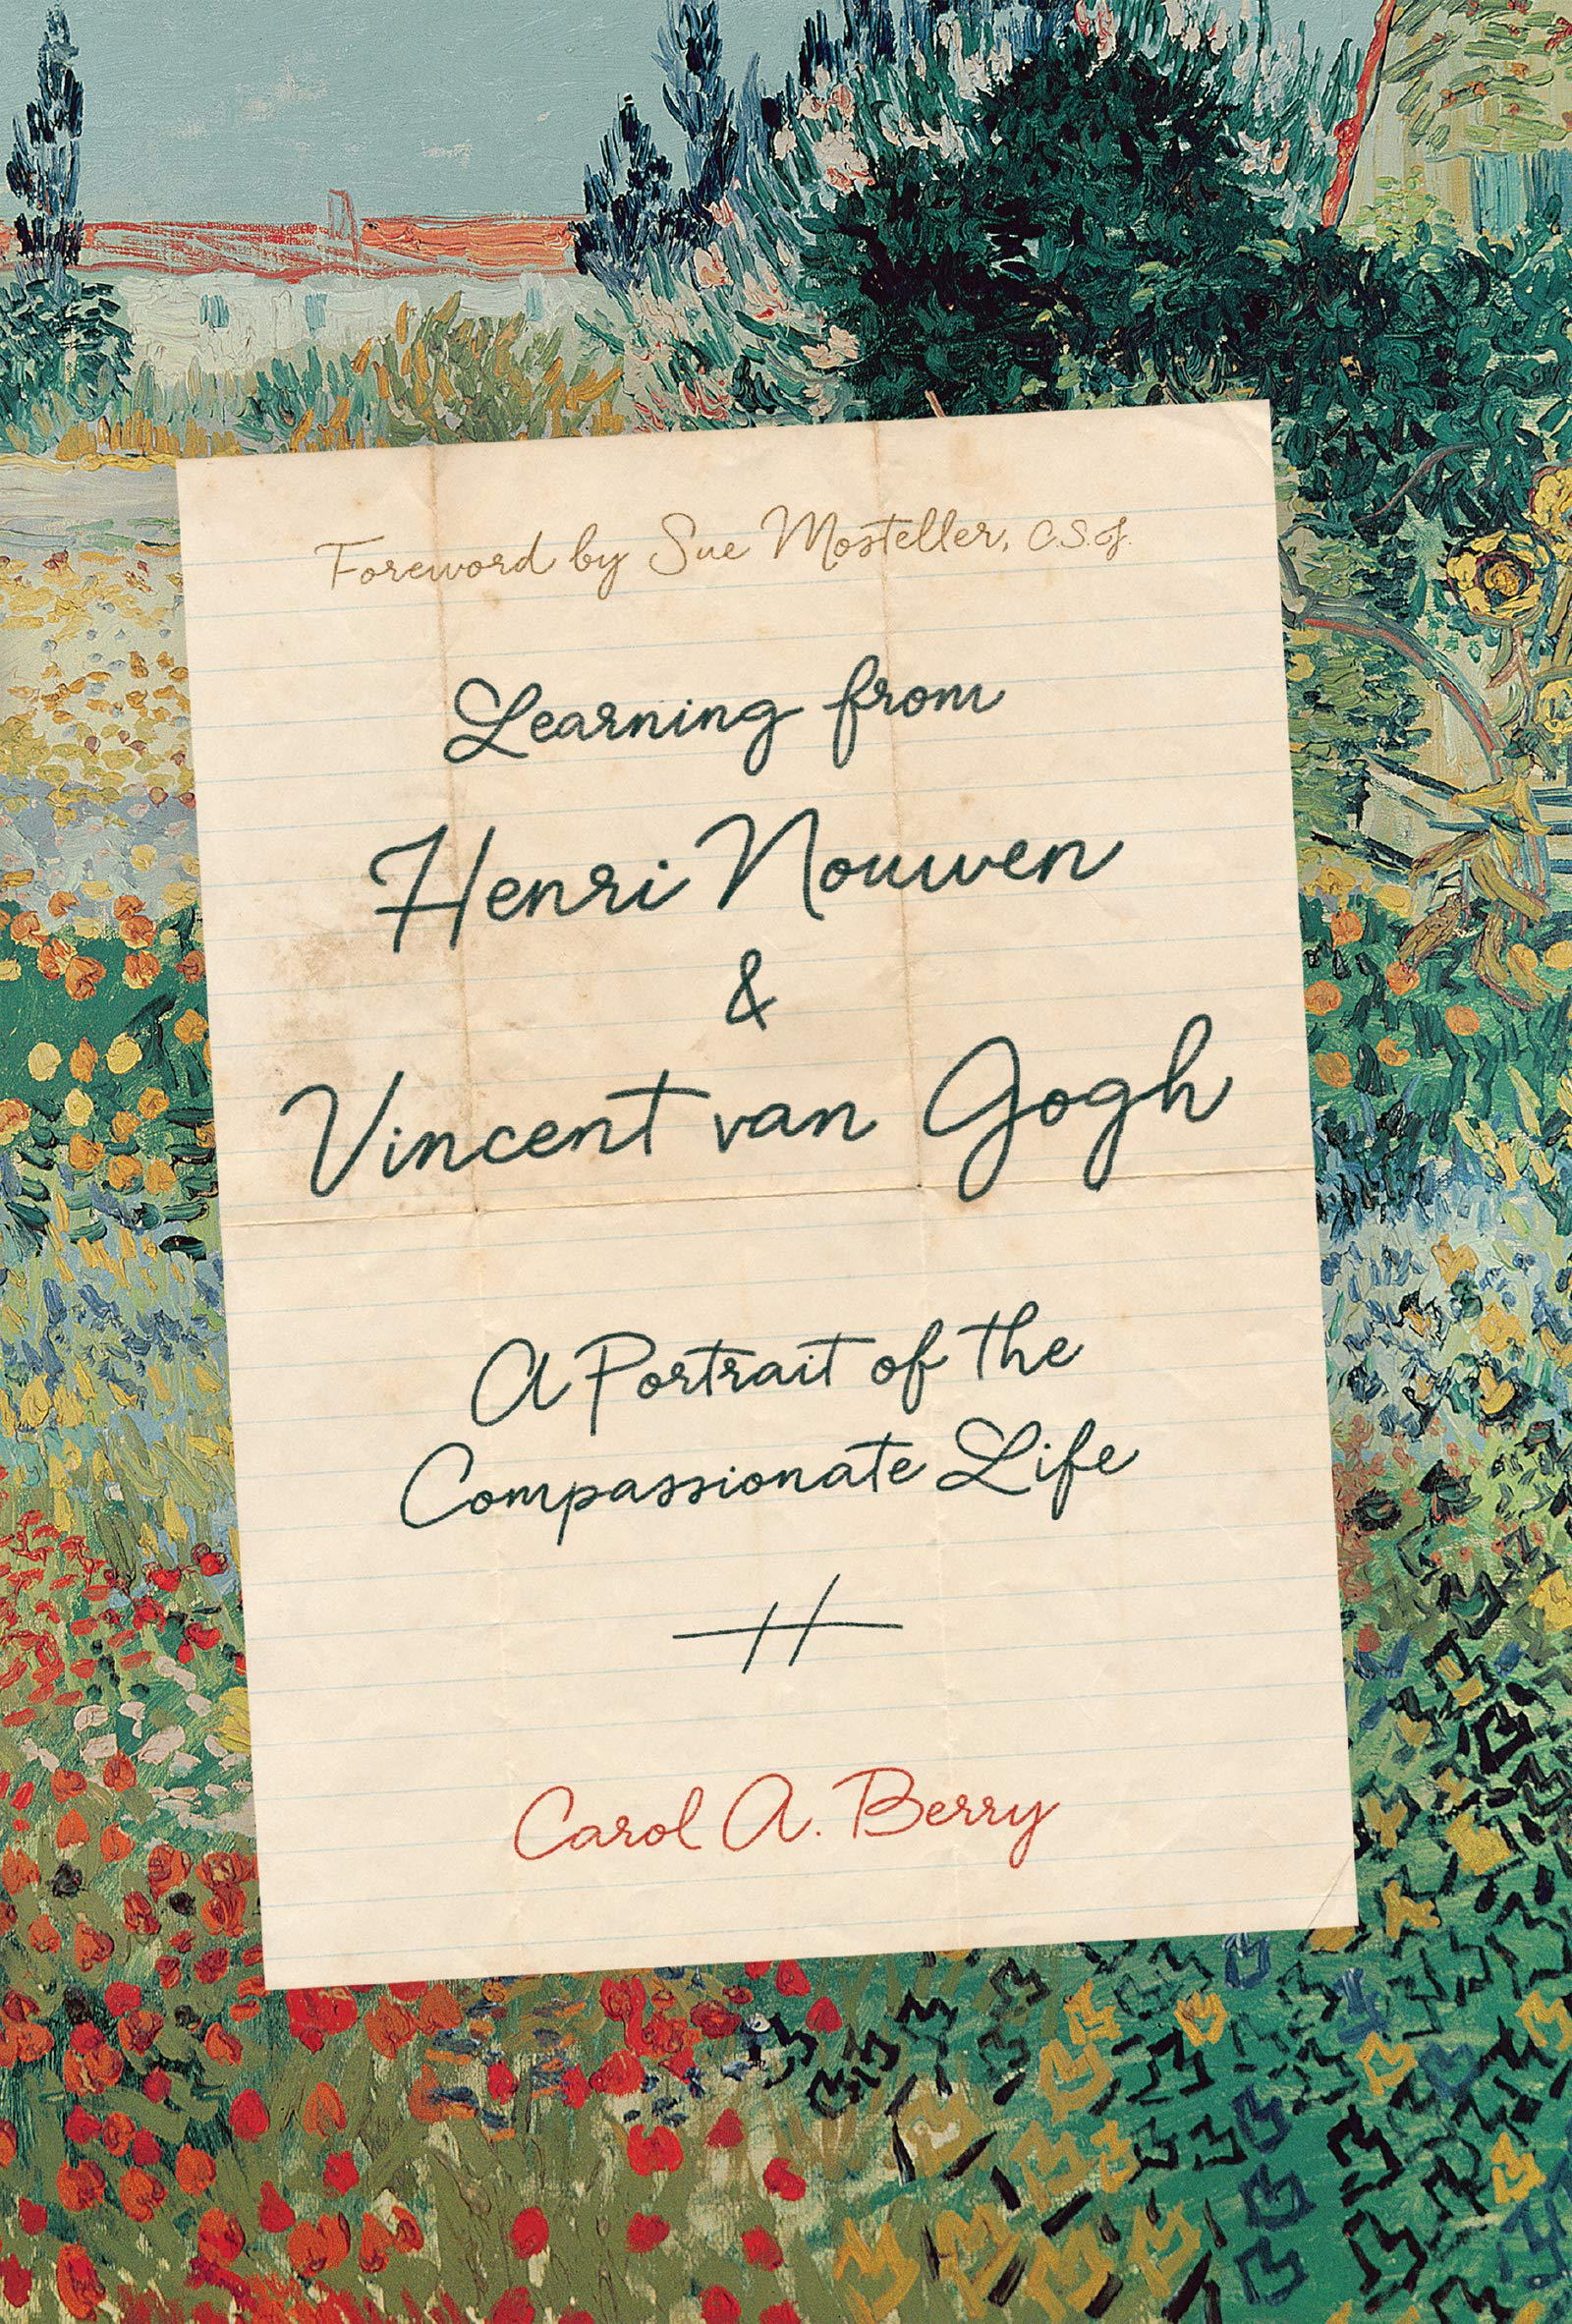 https://www.amazon.com/Learning-Henri-Nouwen-Vincent-Gogh/dp/0830846514/ref=ya_st_pd_dx_wl_4/130-0423524-6390846?_encoding=UTF8&pd_rd_i=0830846514&pd_rd_r=821b3e7c-9927-4997-93ed-d73481f58a5c&pd_rd_w=Rrtkb&pd_rd_wg=OKpM9&psc=1&refRID=086QCVV3A6JQ56YX97MV